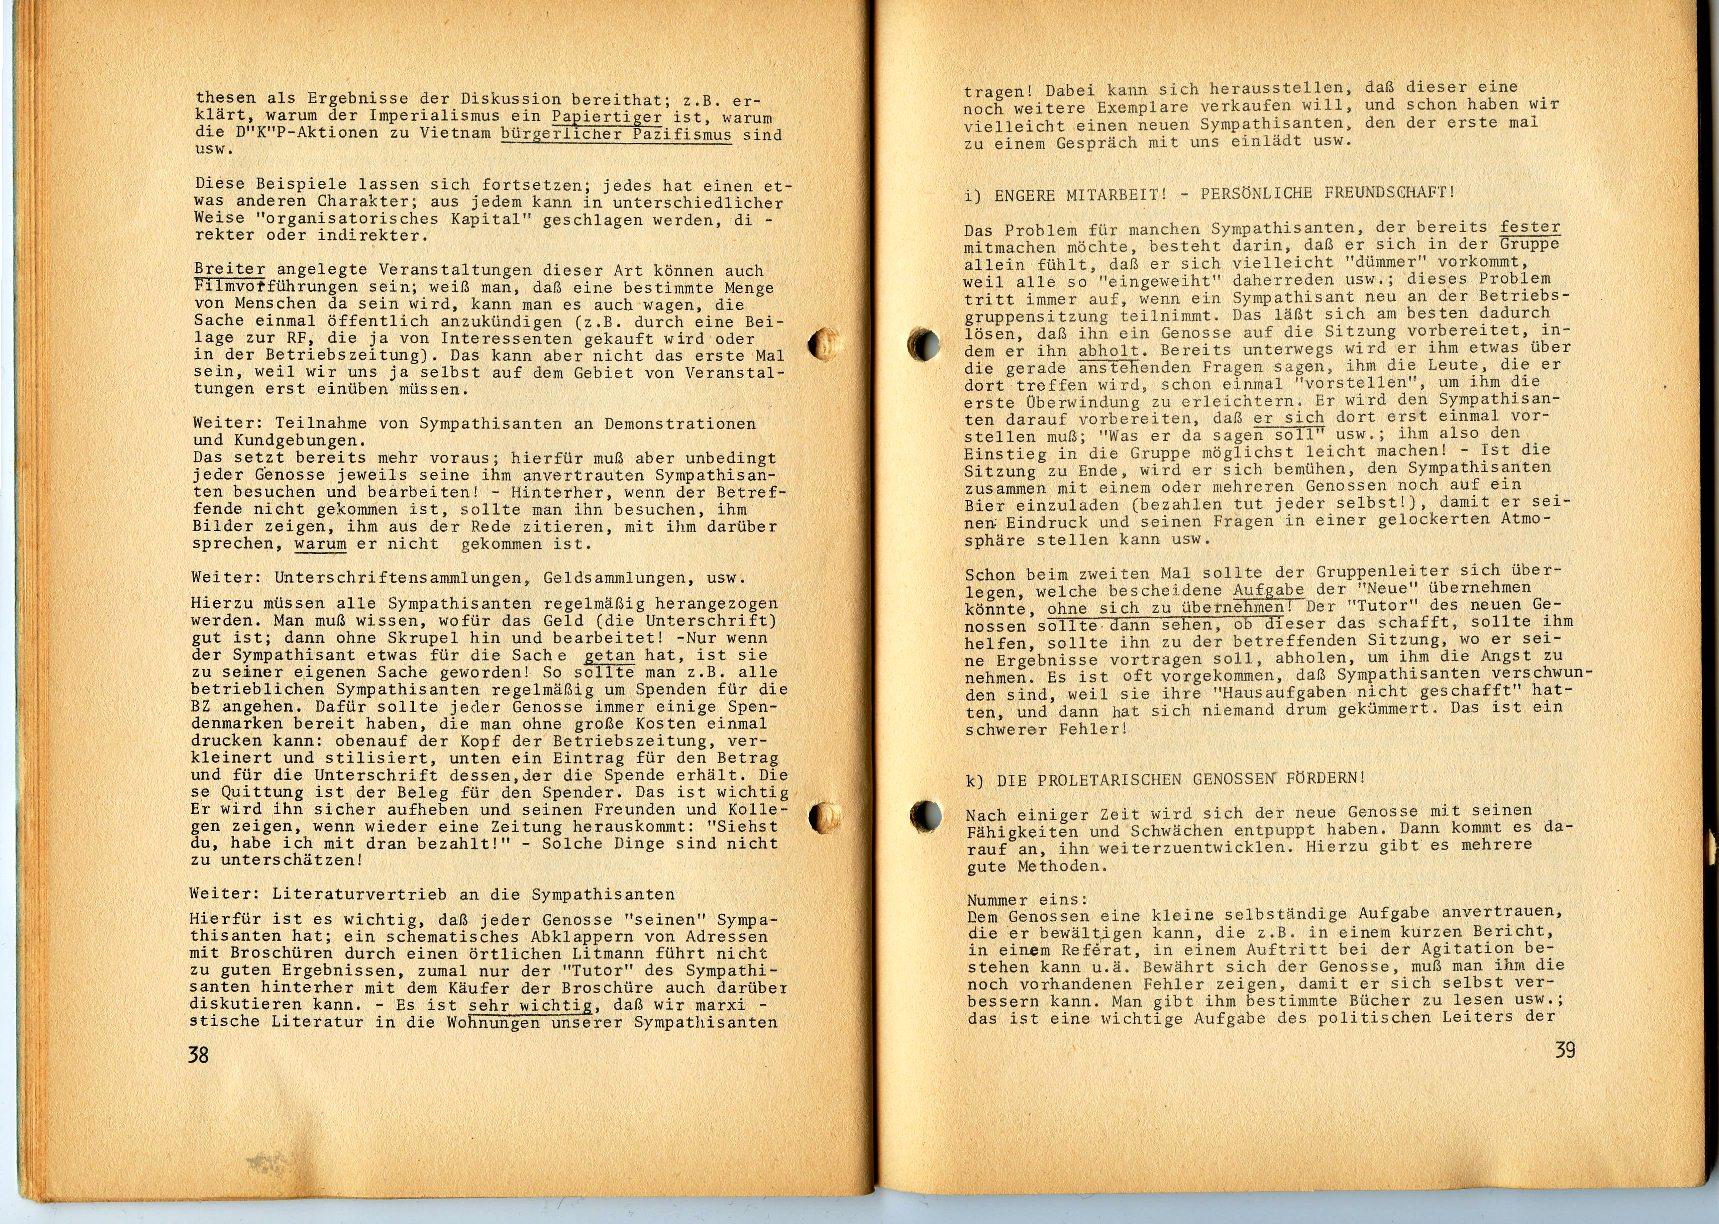 ZB_Parteiarbeiter_1971_04_20